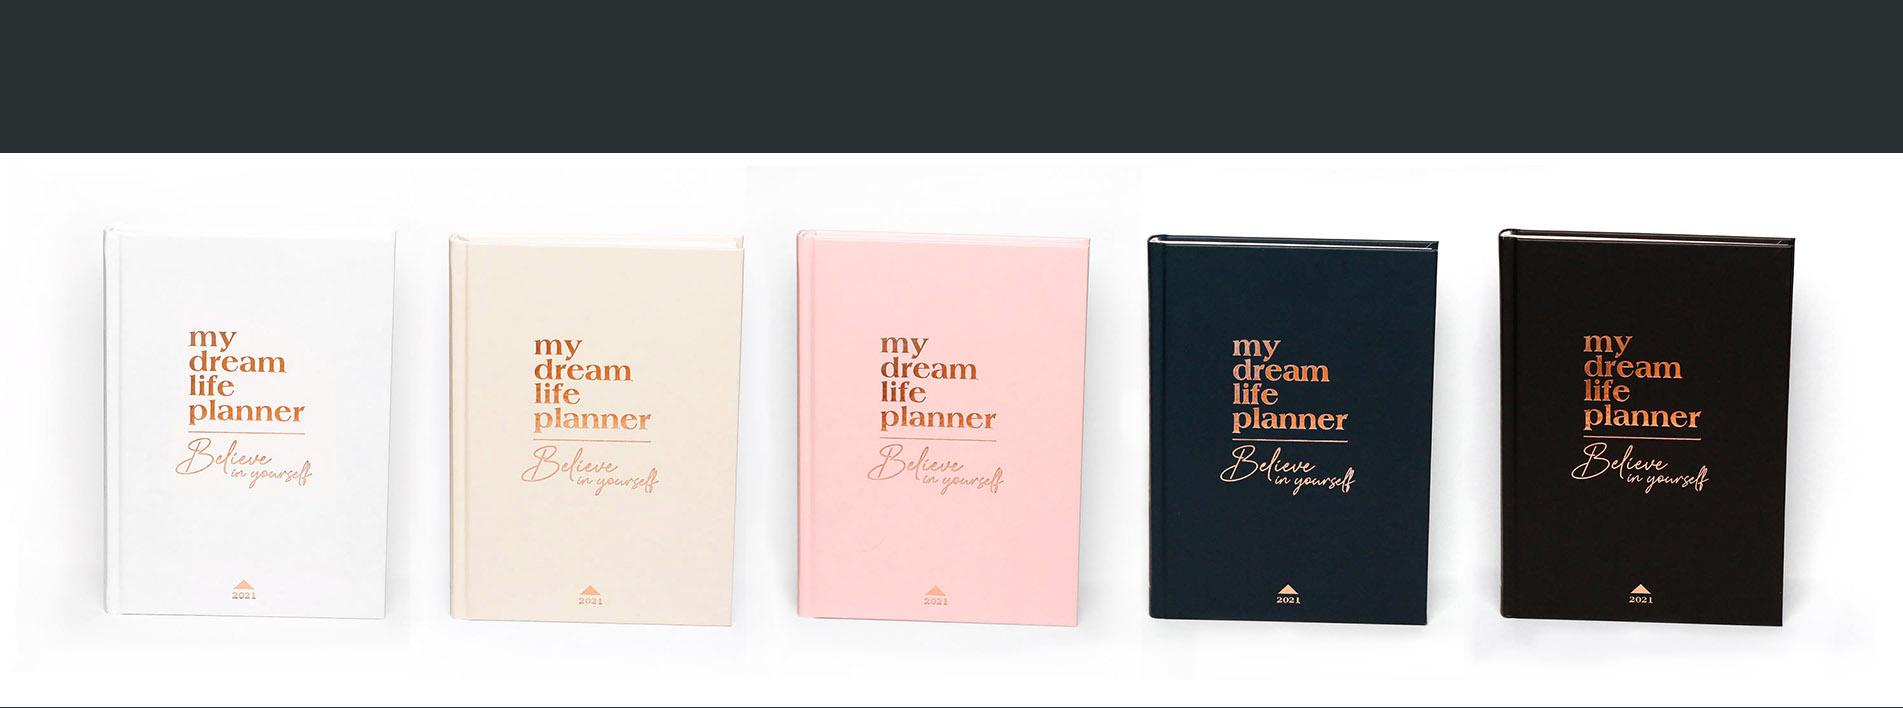 My Dream Life Planner 2021 hataridonaplo